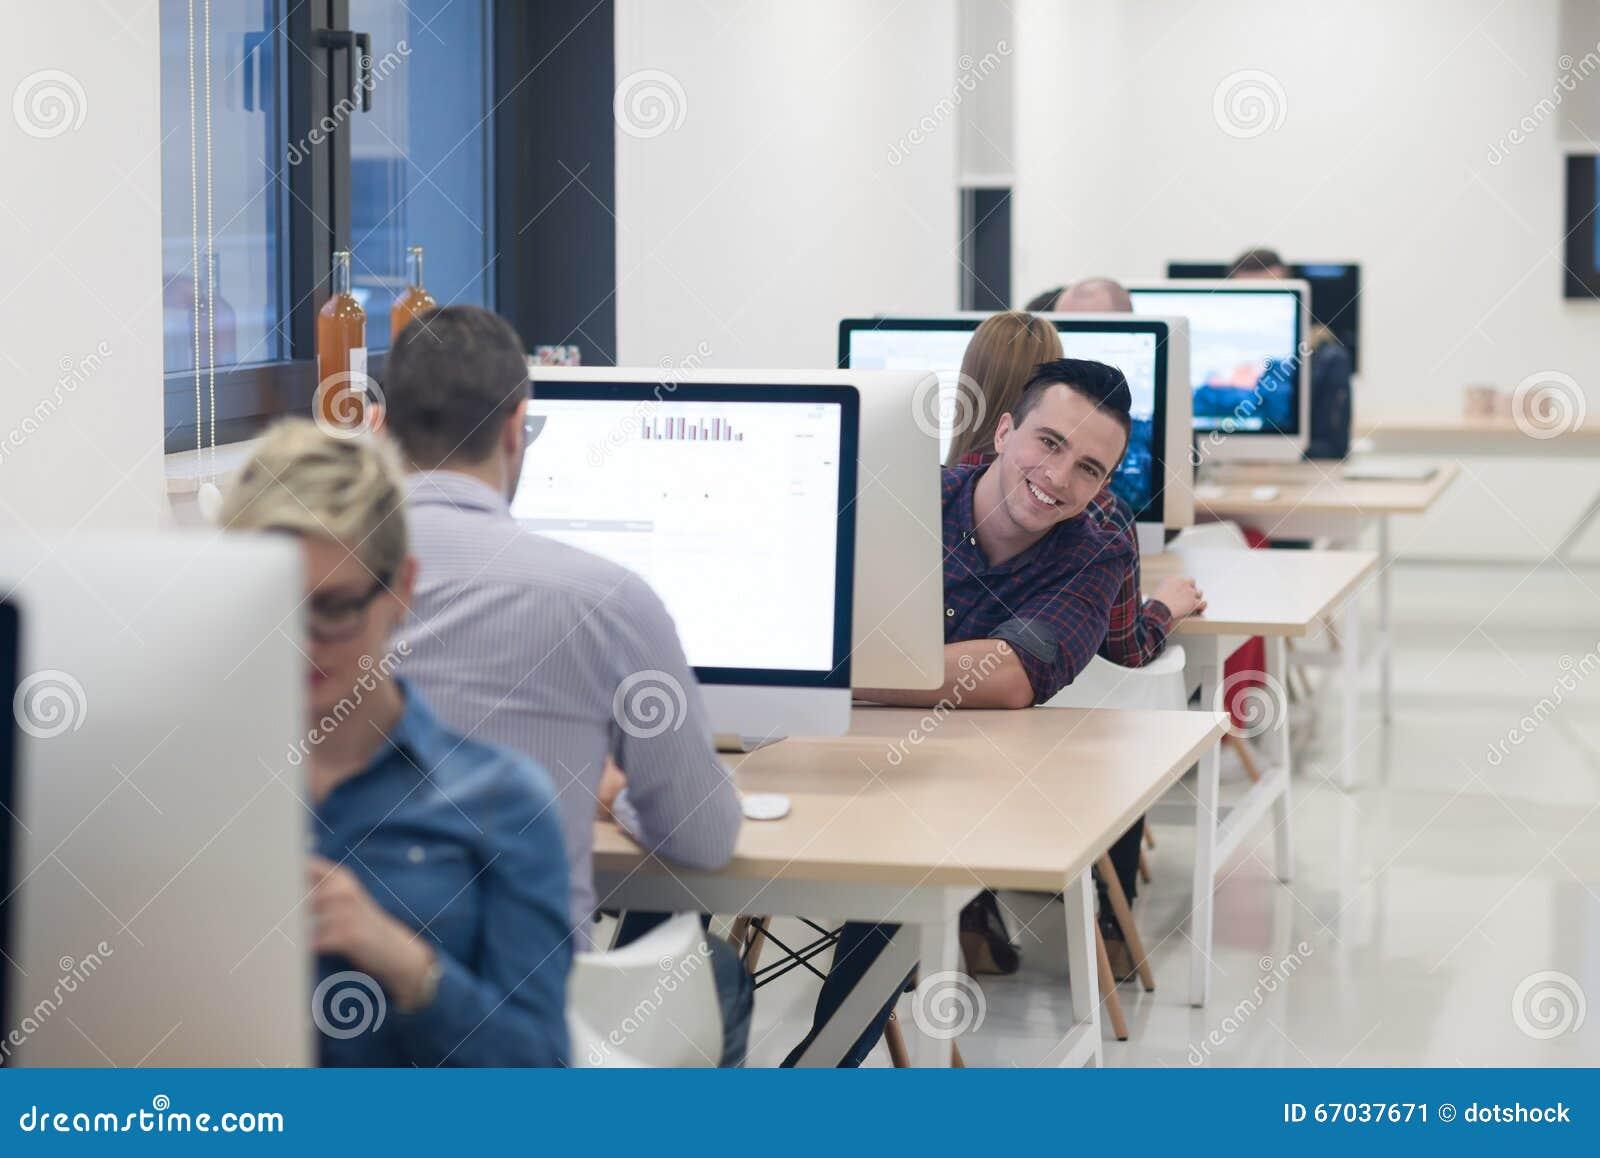 Commercial Software Development : Startup business software developer working on desktop